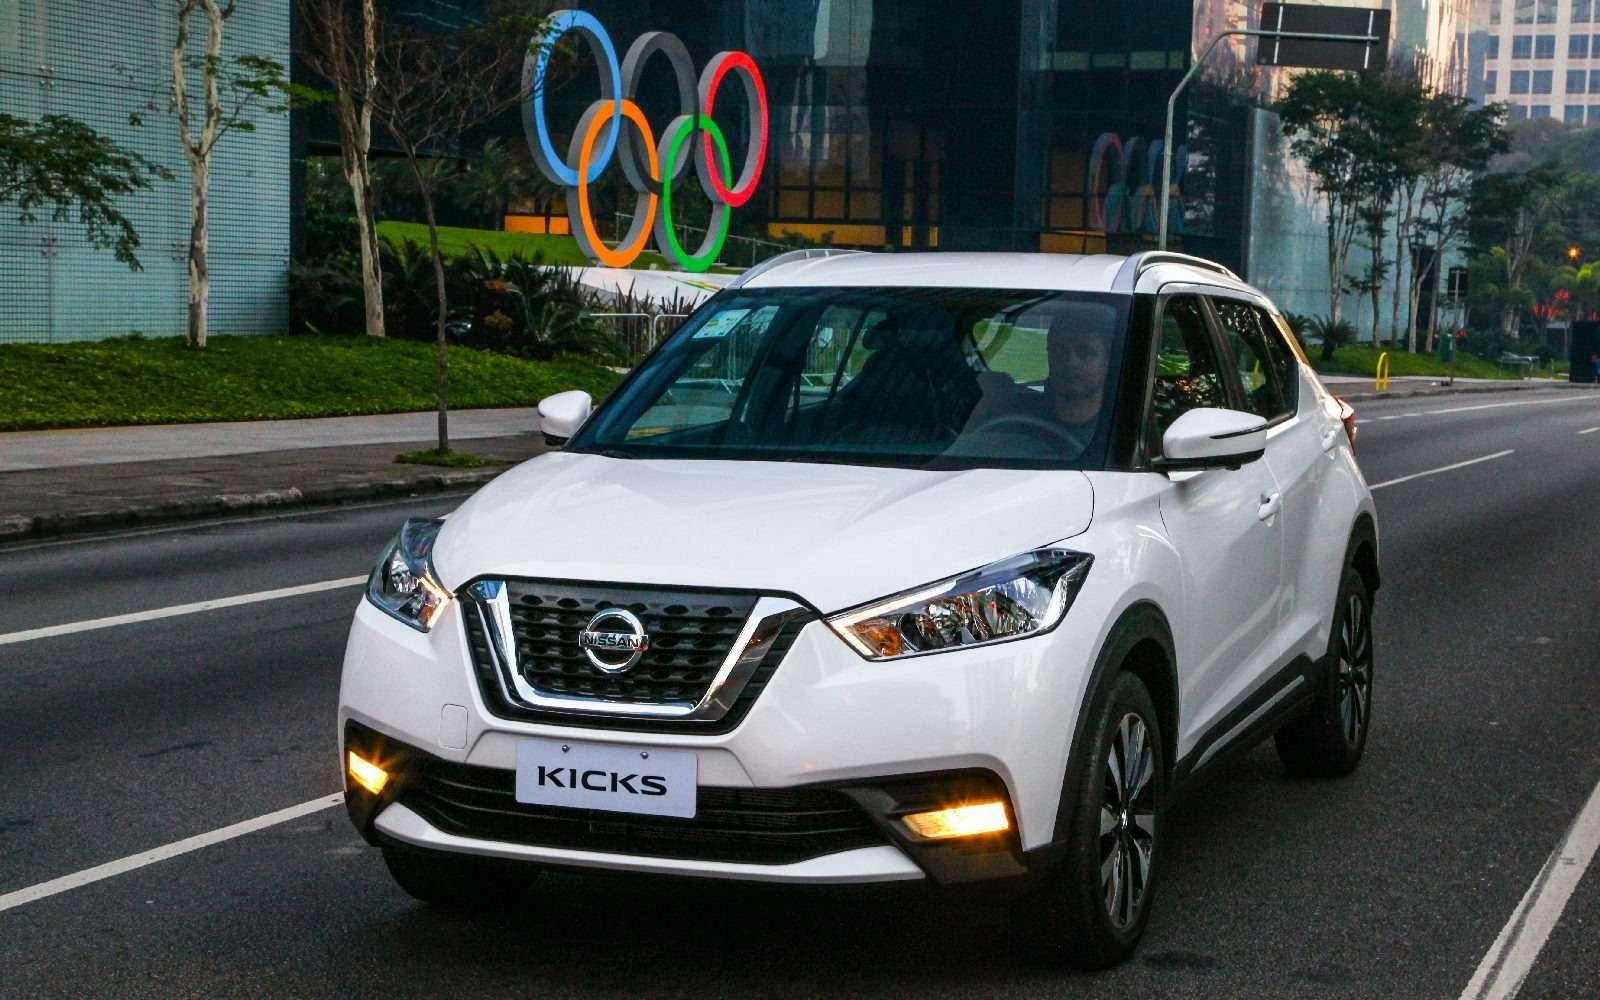 Олимпийский пинок: Nissan Kicks готовится покорять Бразилию— фото 612324